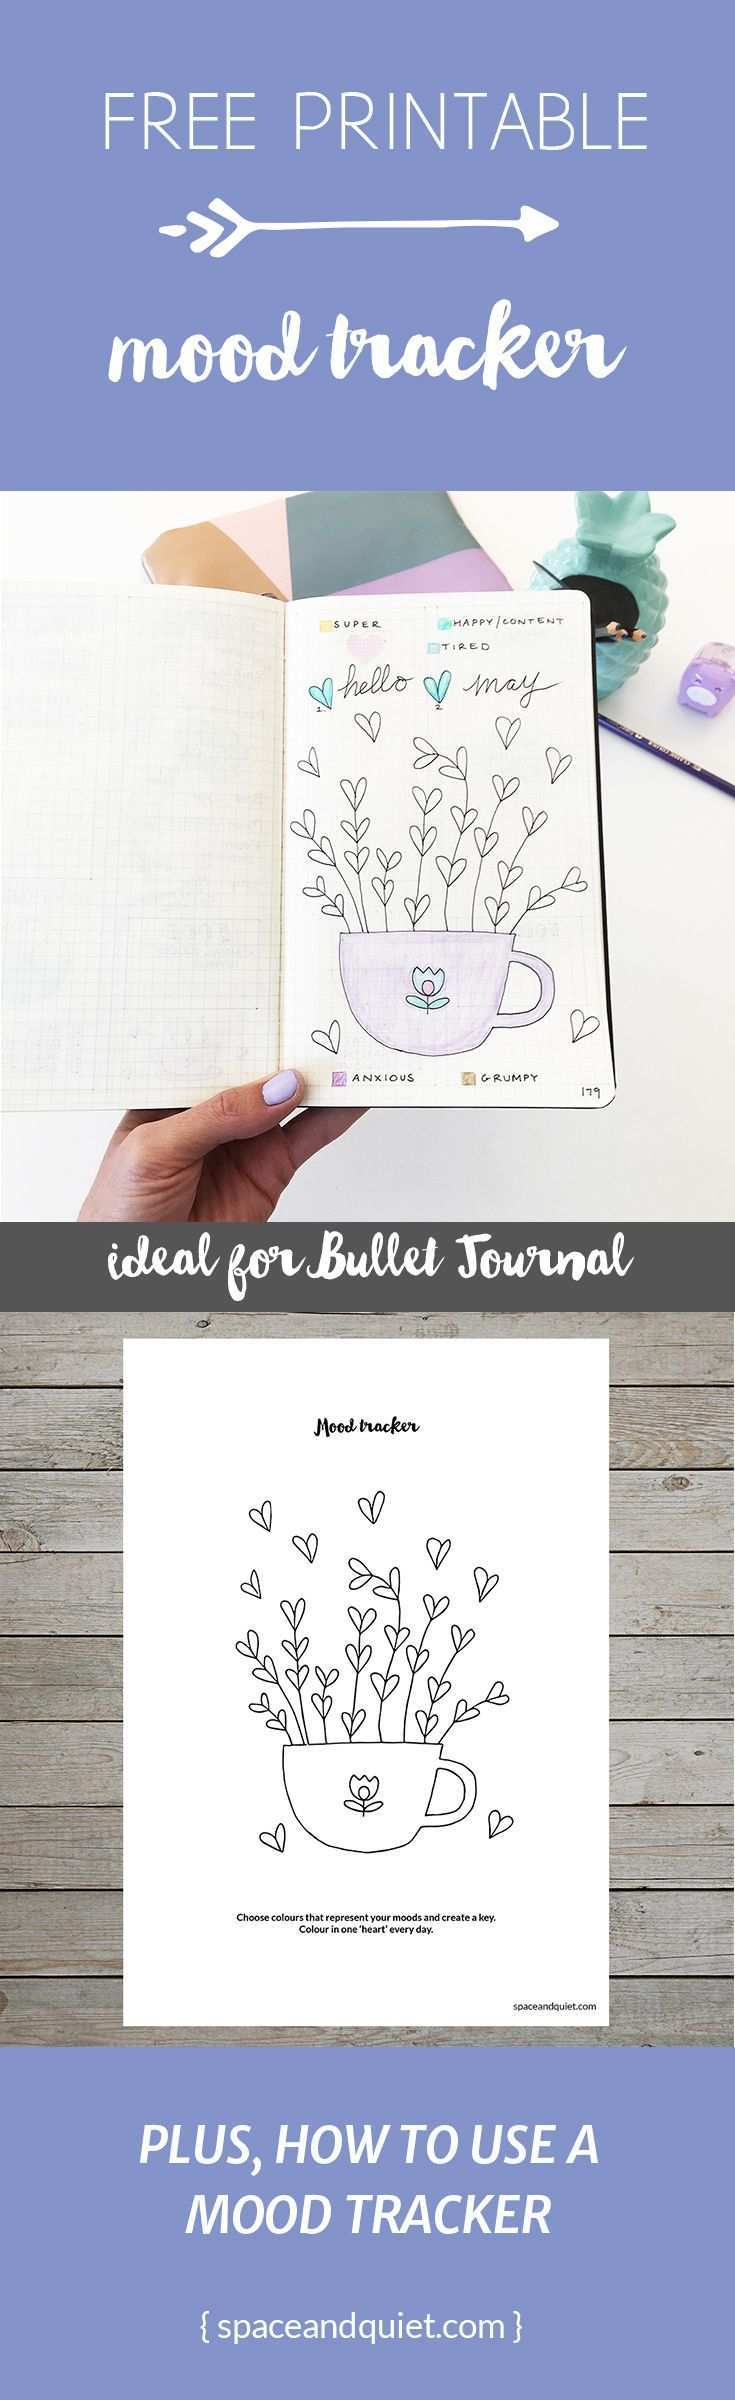 Printable Mood Tracker For Bullet Journal Free Download Bullet Journal Mood Bullet Journal Bullet Journal Printables